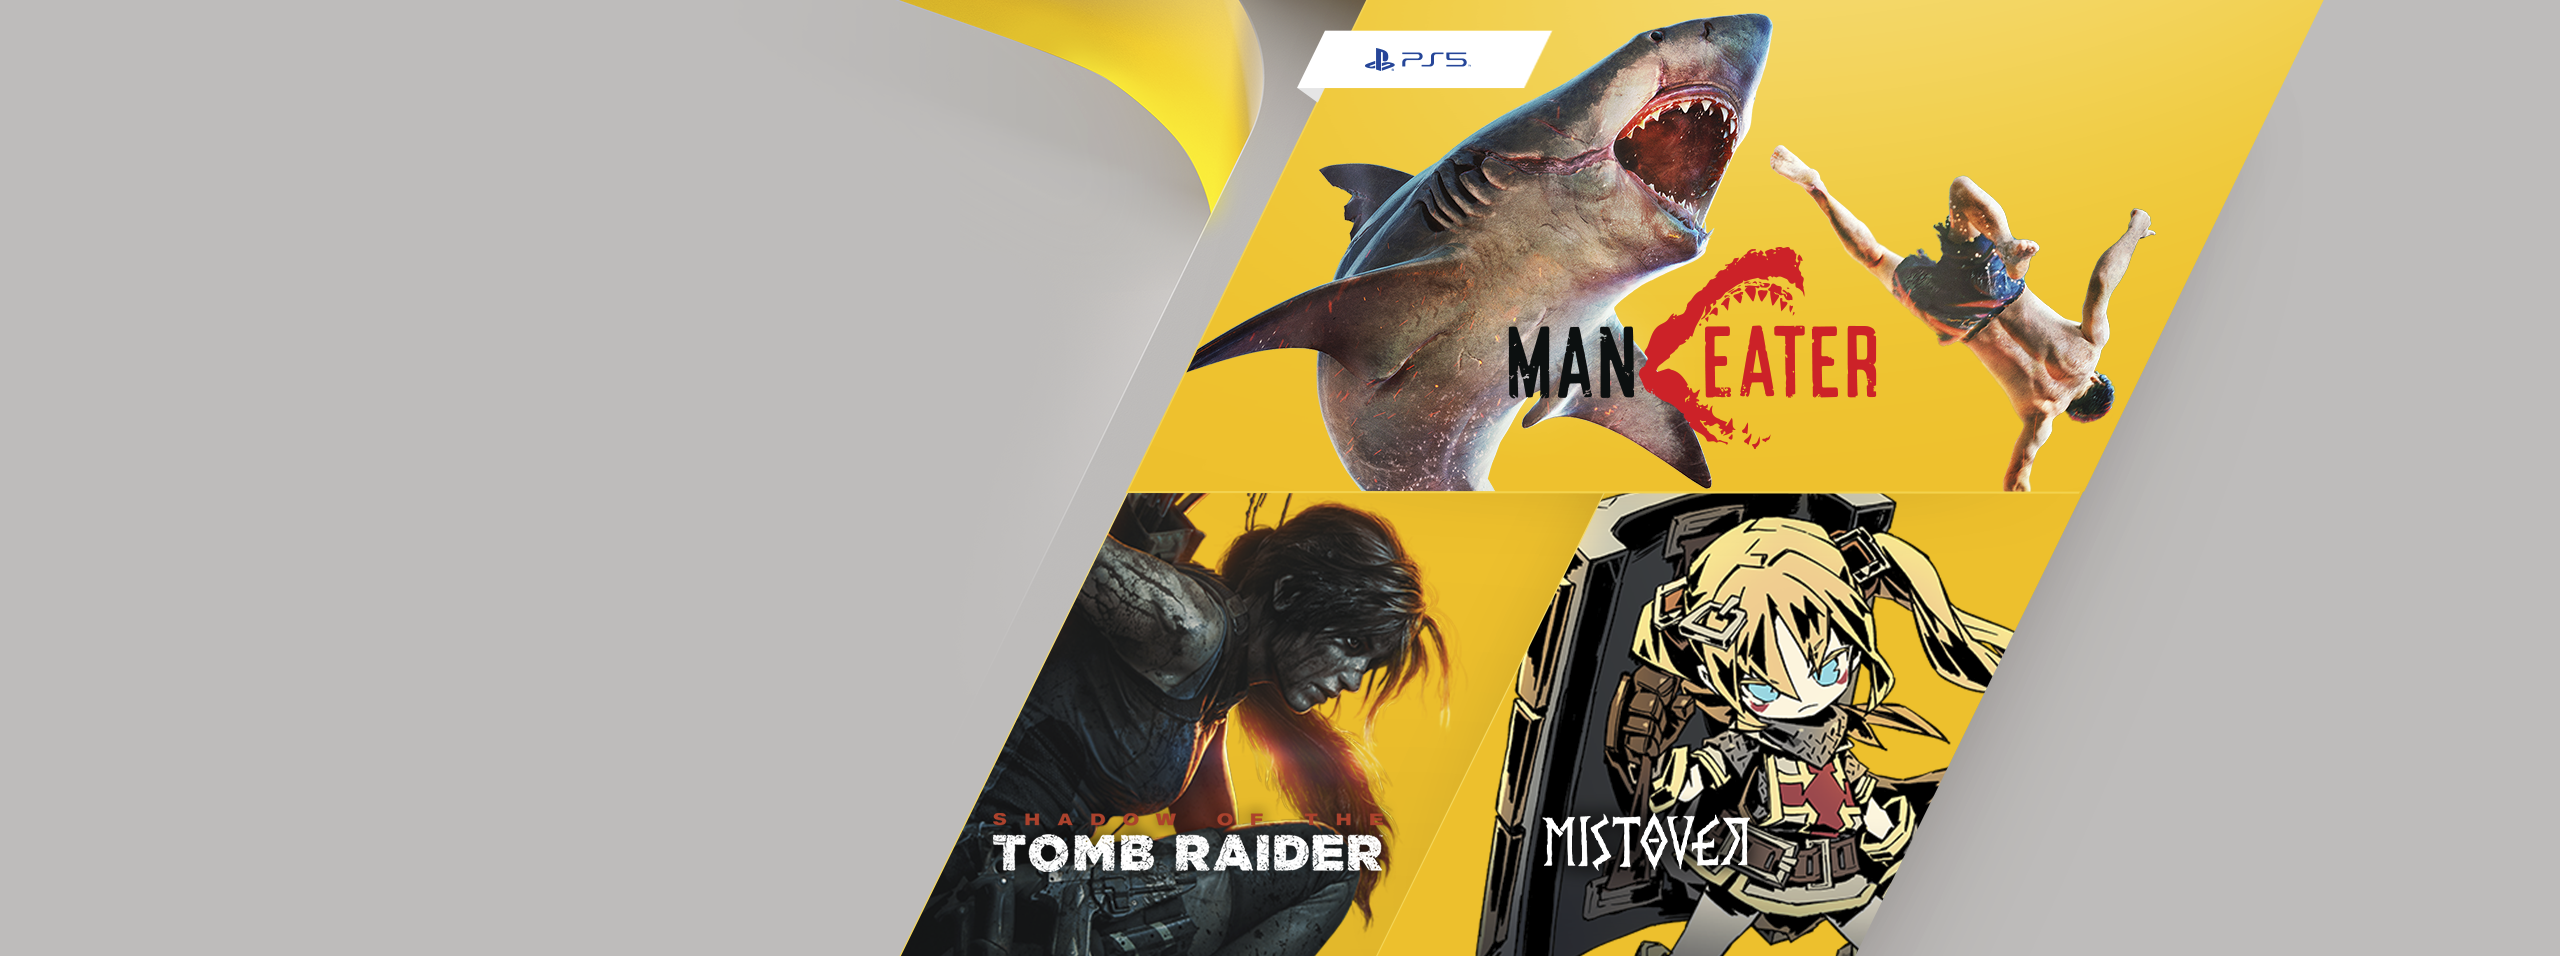 PlayStation Plus - オンラインマルチプレイ、毎月のフリープレイ、限定割引などにアクセスしてPlayStationをもっと楽しもう。